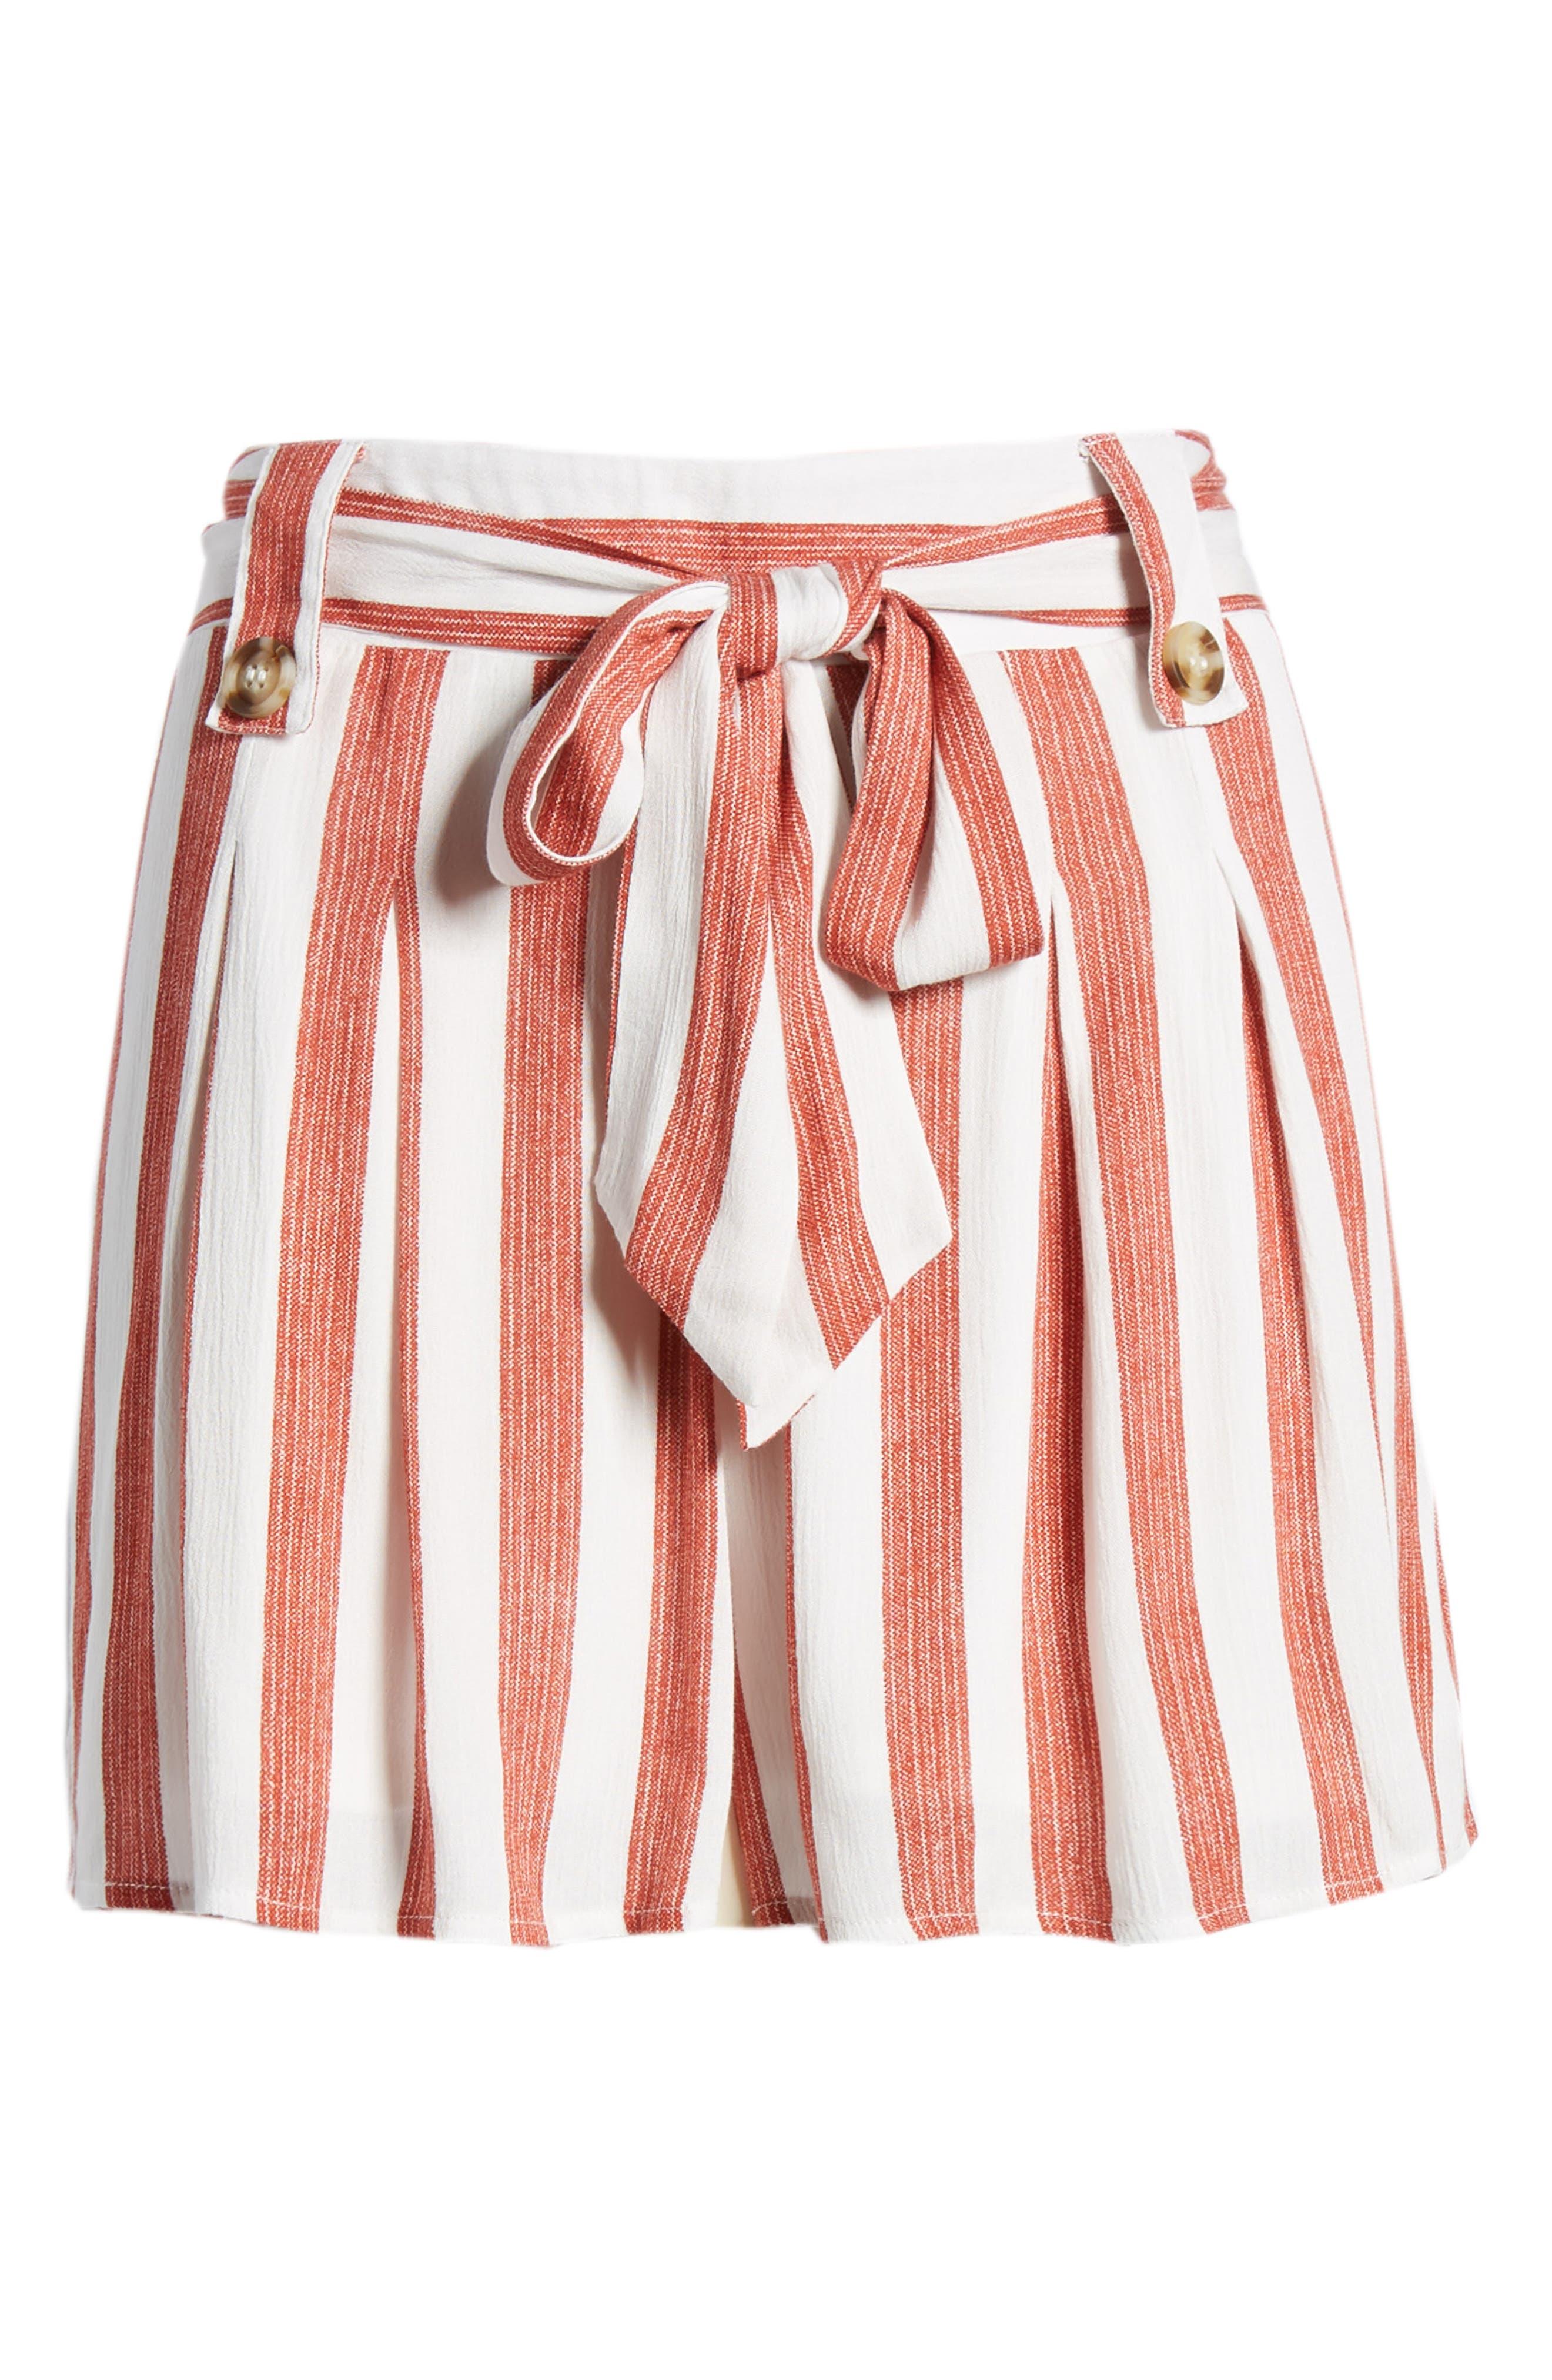 Stripe Shorts,                             Alternate thumbnail 7, color,                             Red/ Ivory